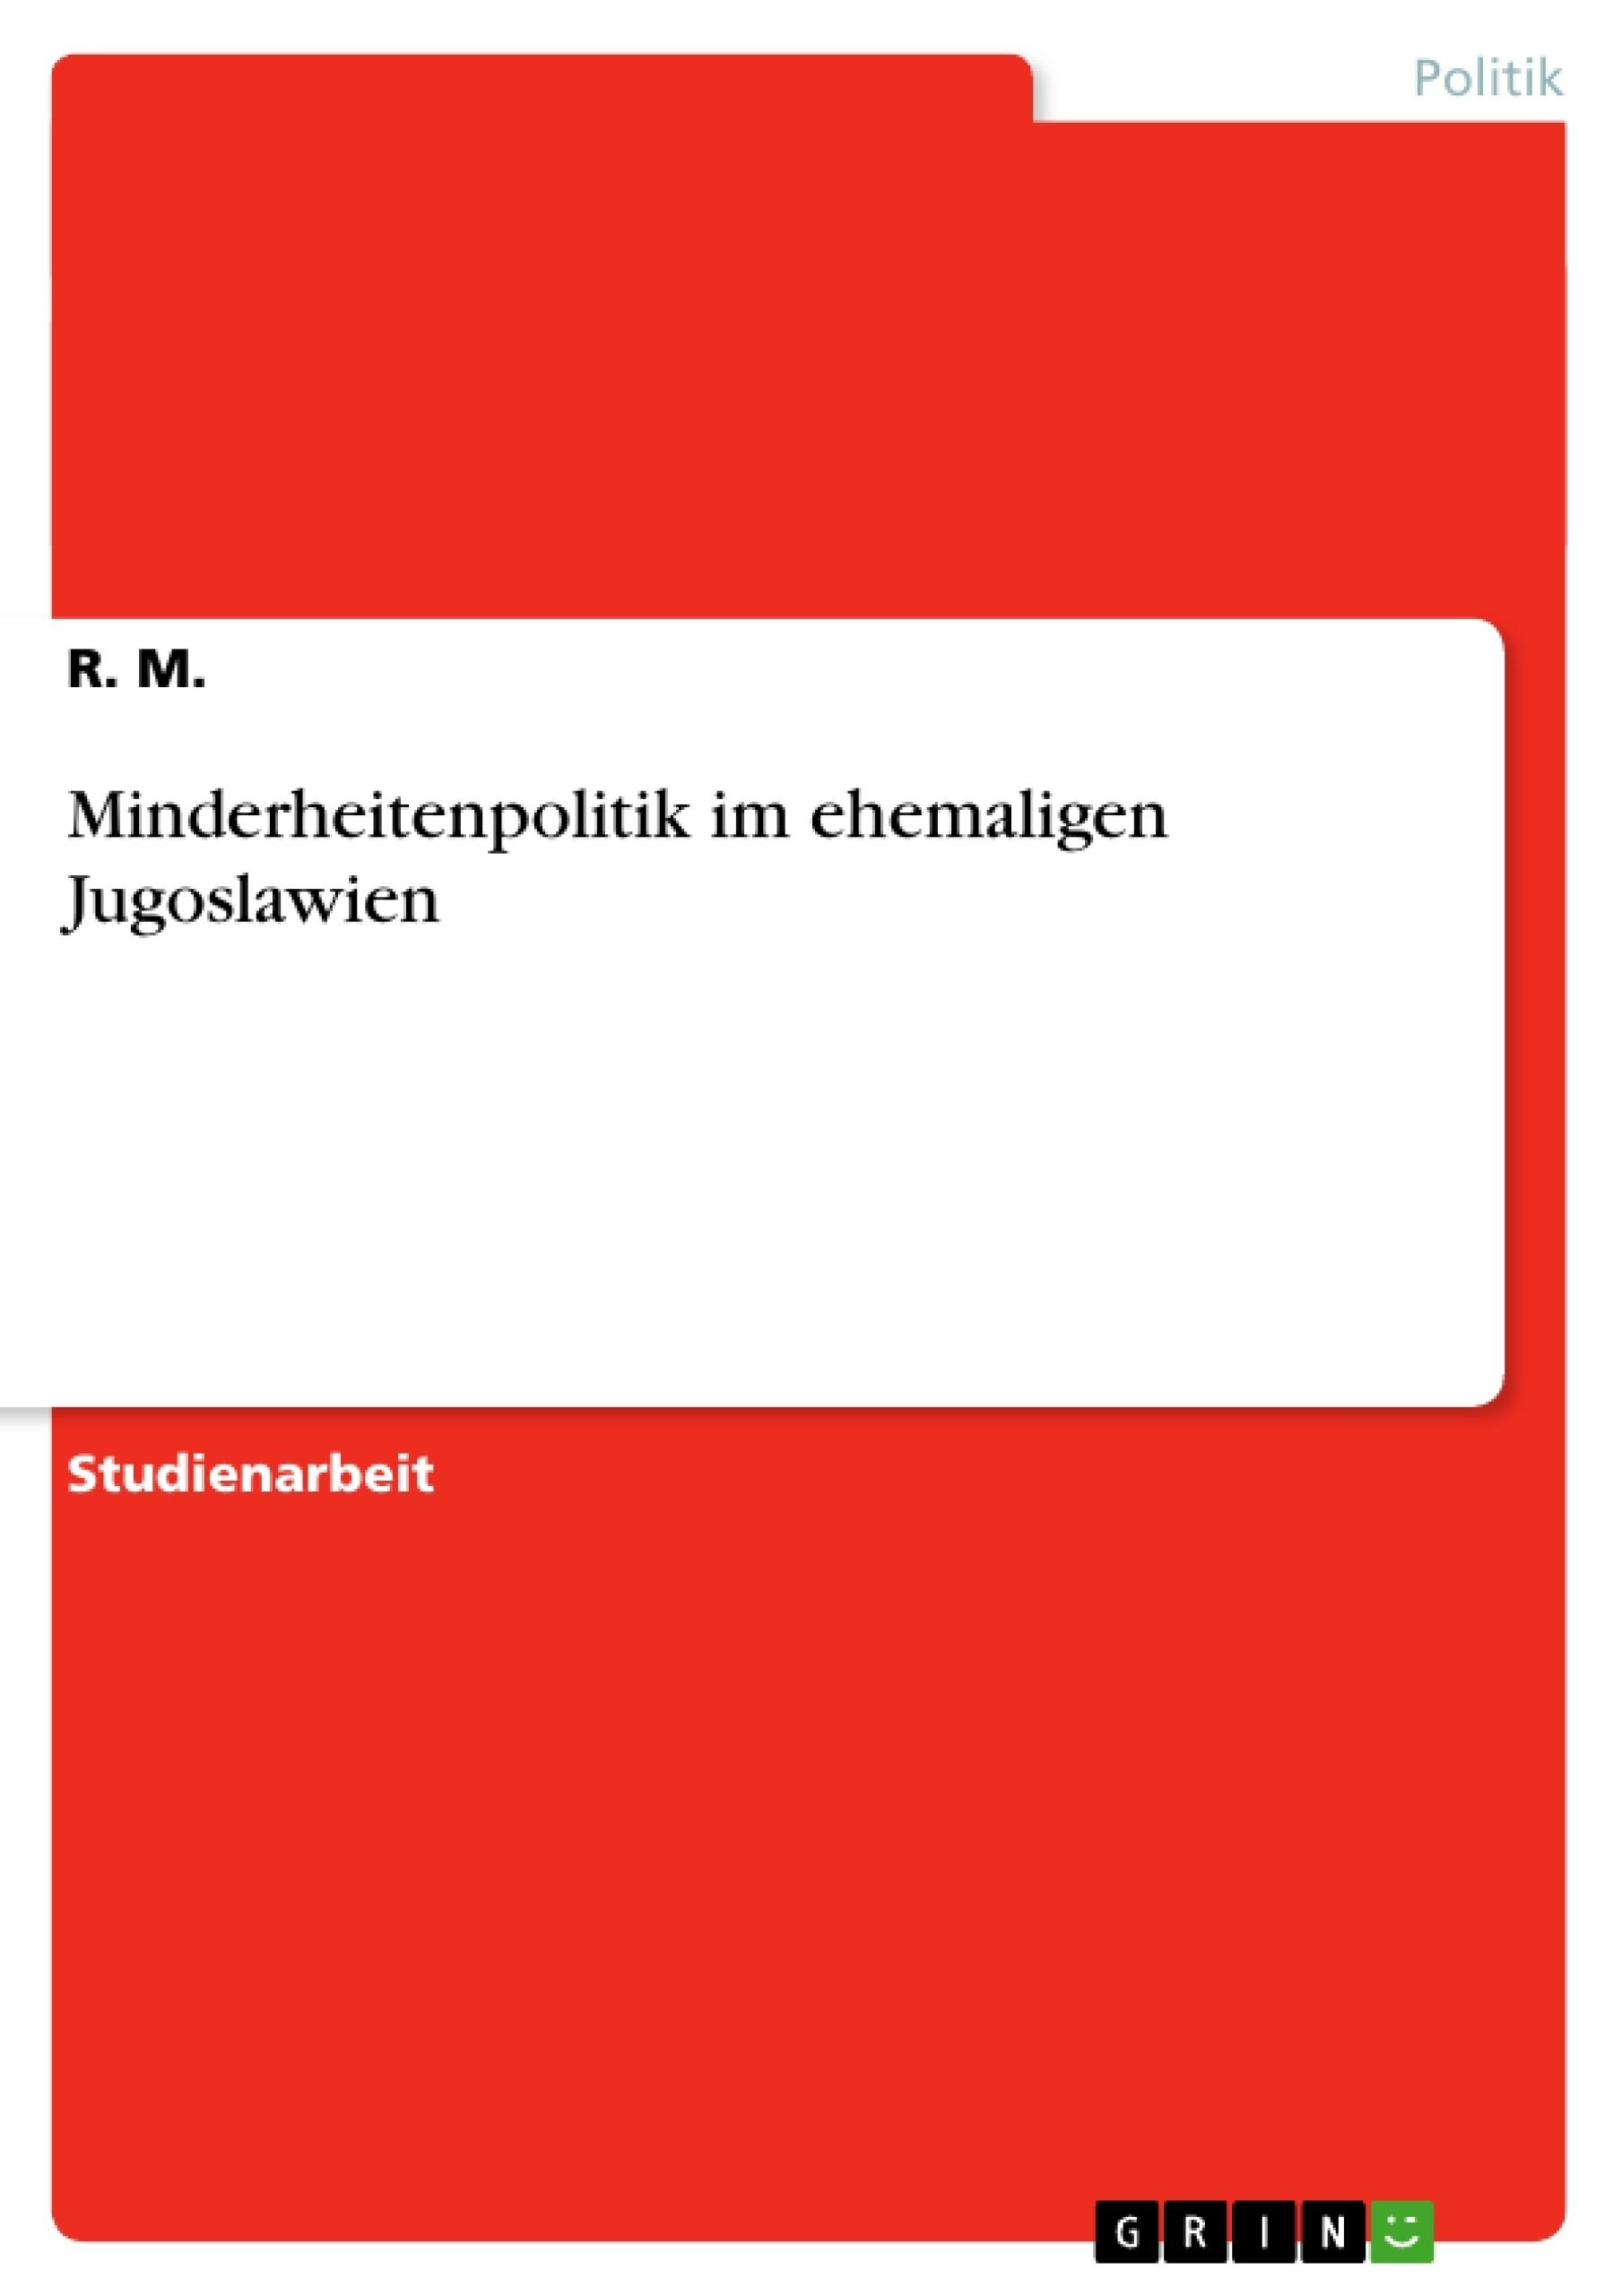 Titel: Minderheitenpolitik im ehemaligen Jugoslawien